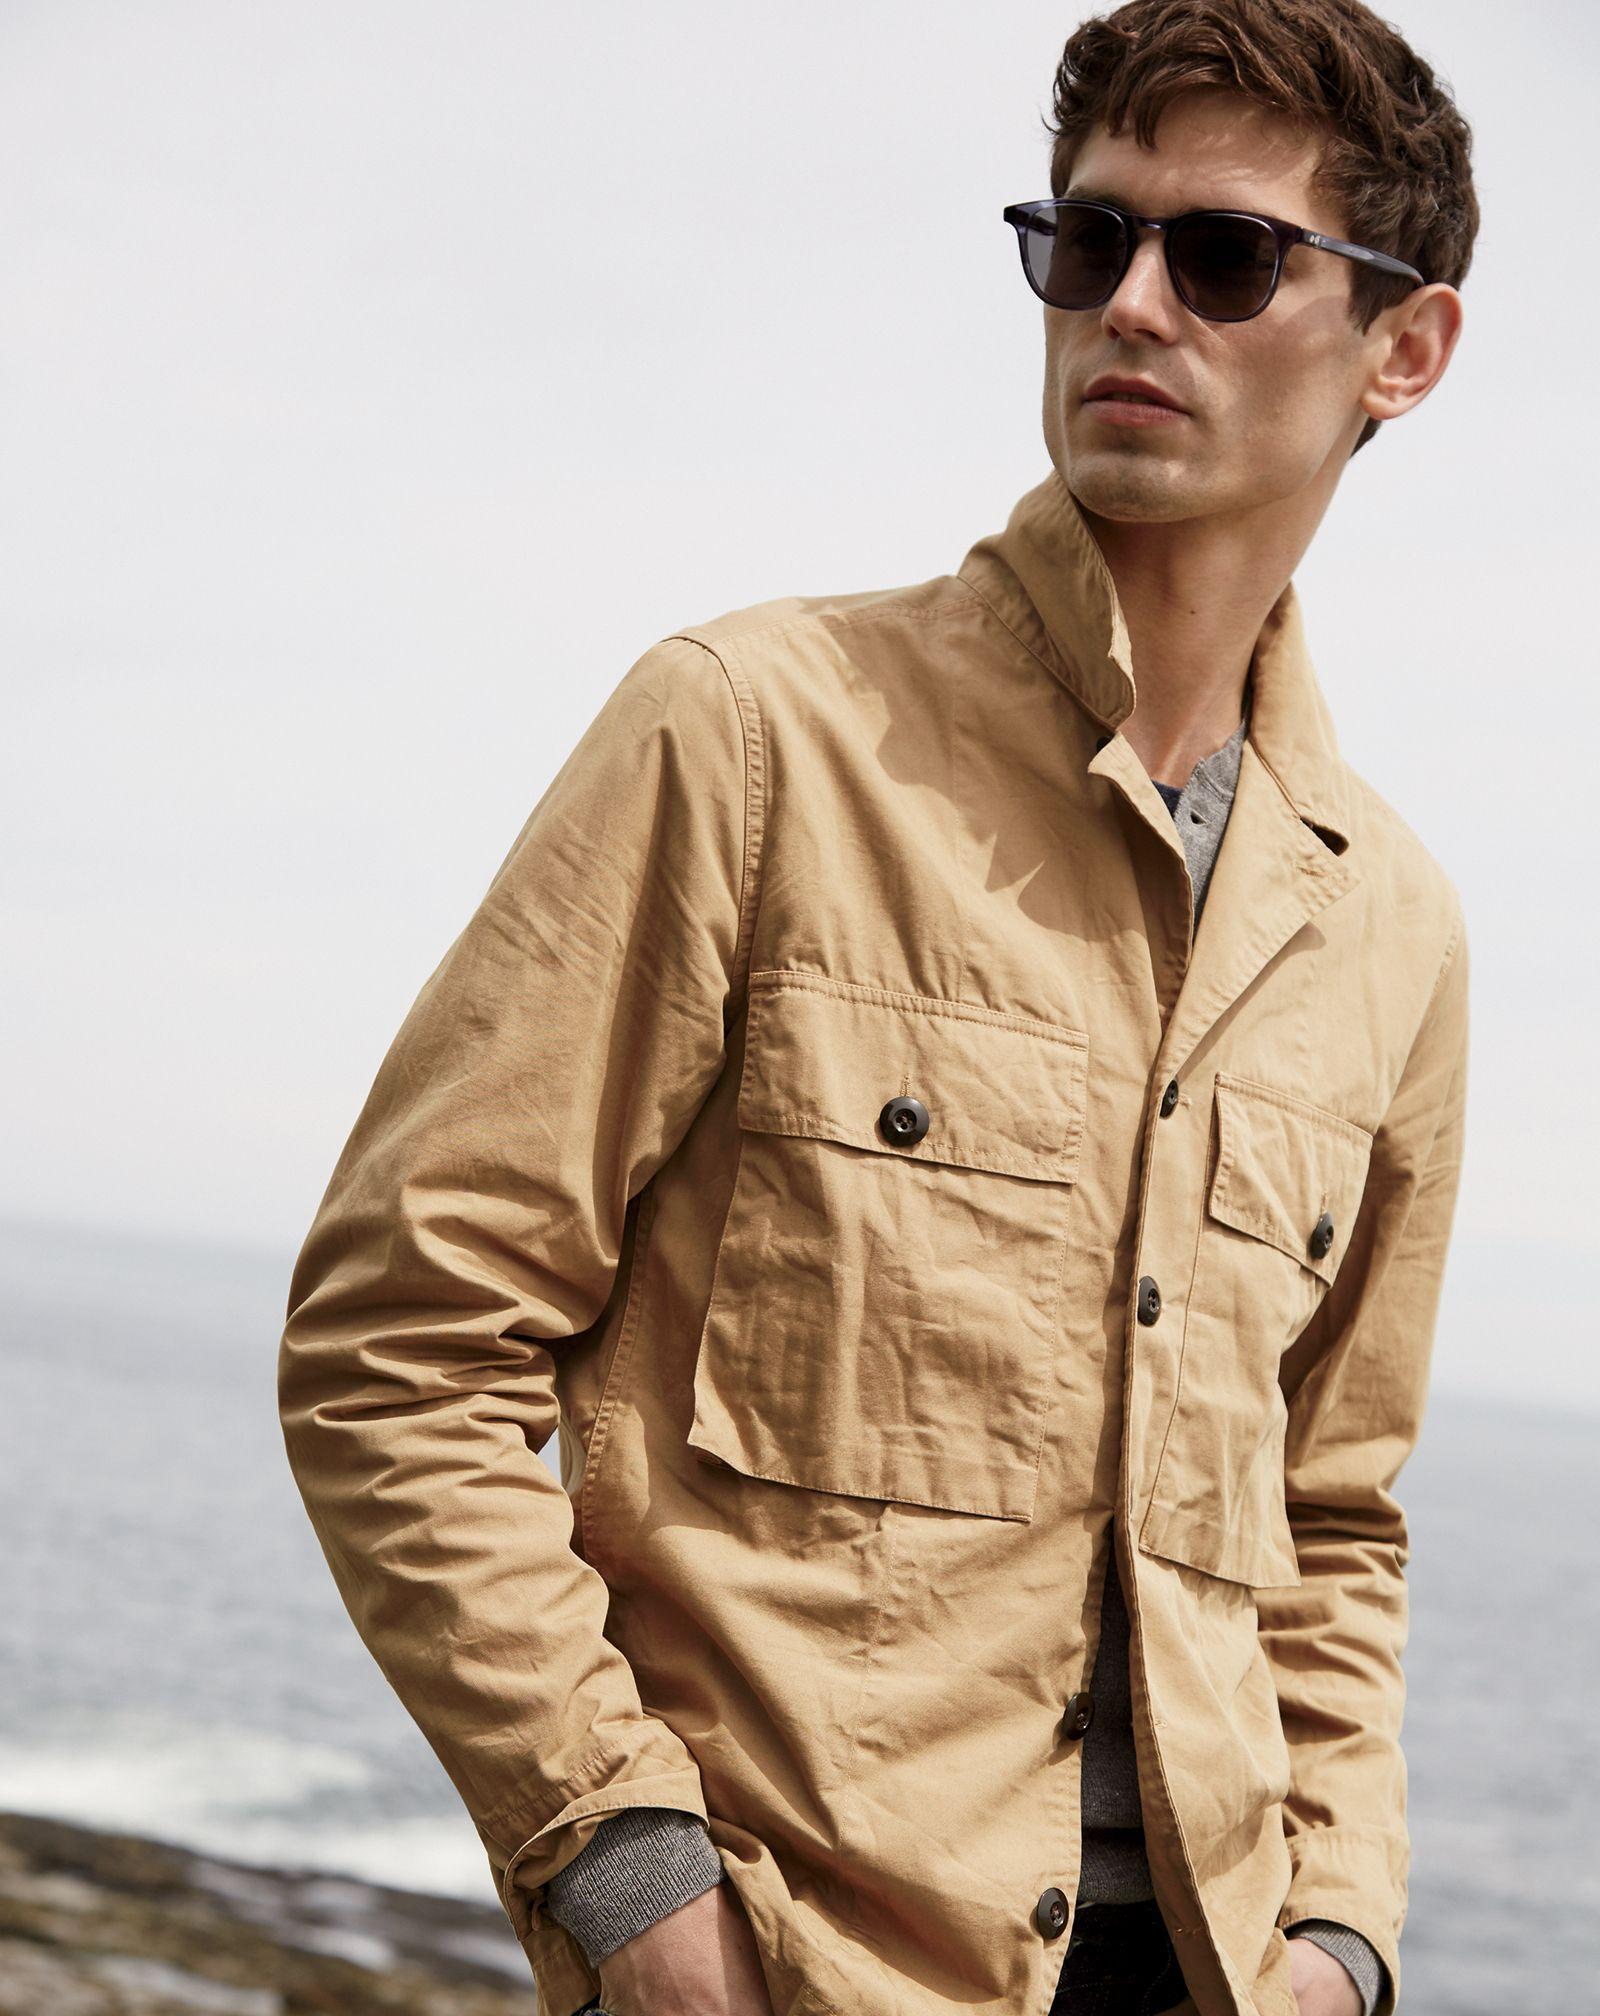 669e0ec18 J. Crew Men's Wallace & Barnes Military Shirt-Jacket in Khaki | Wish ...